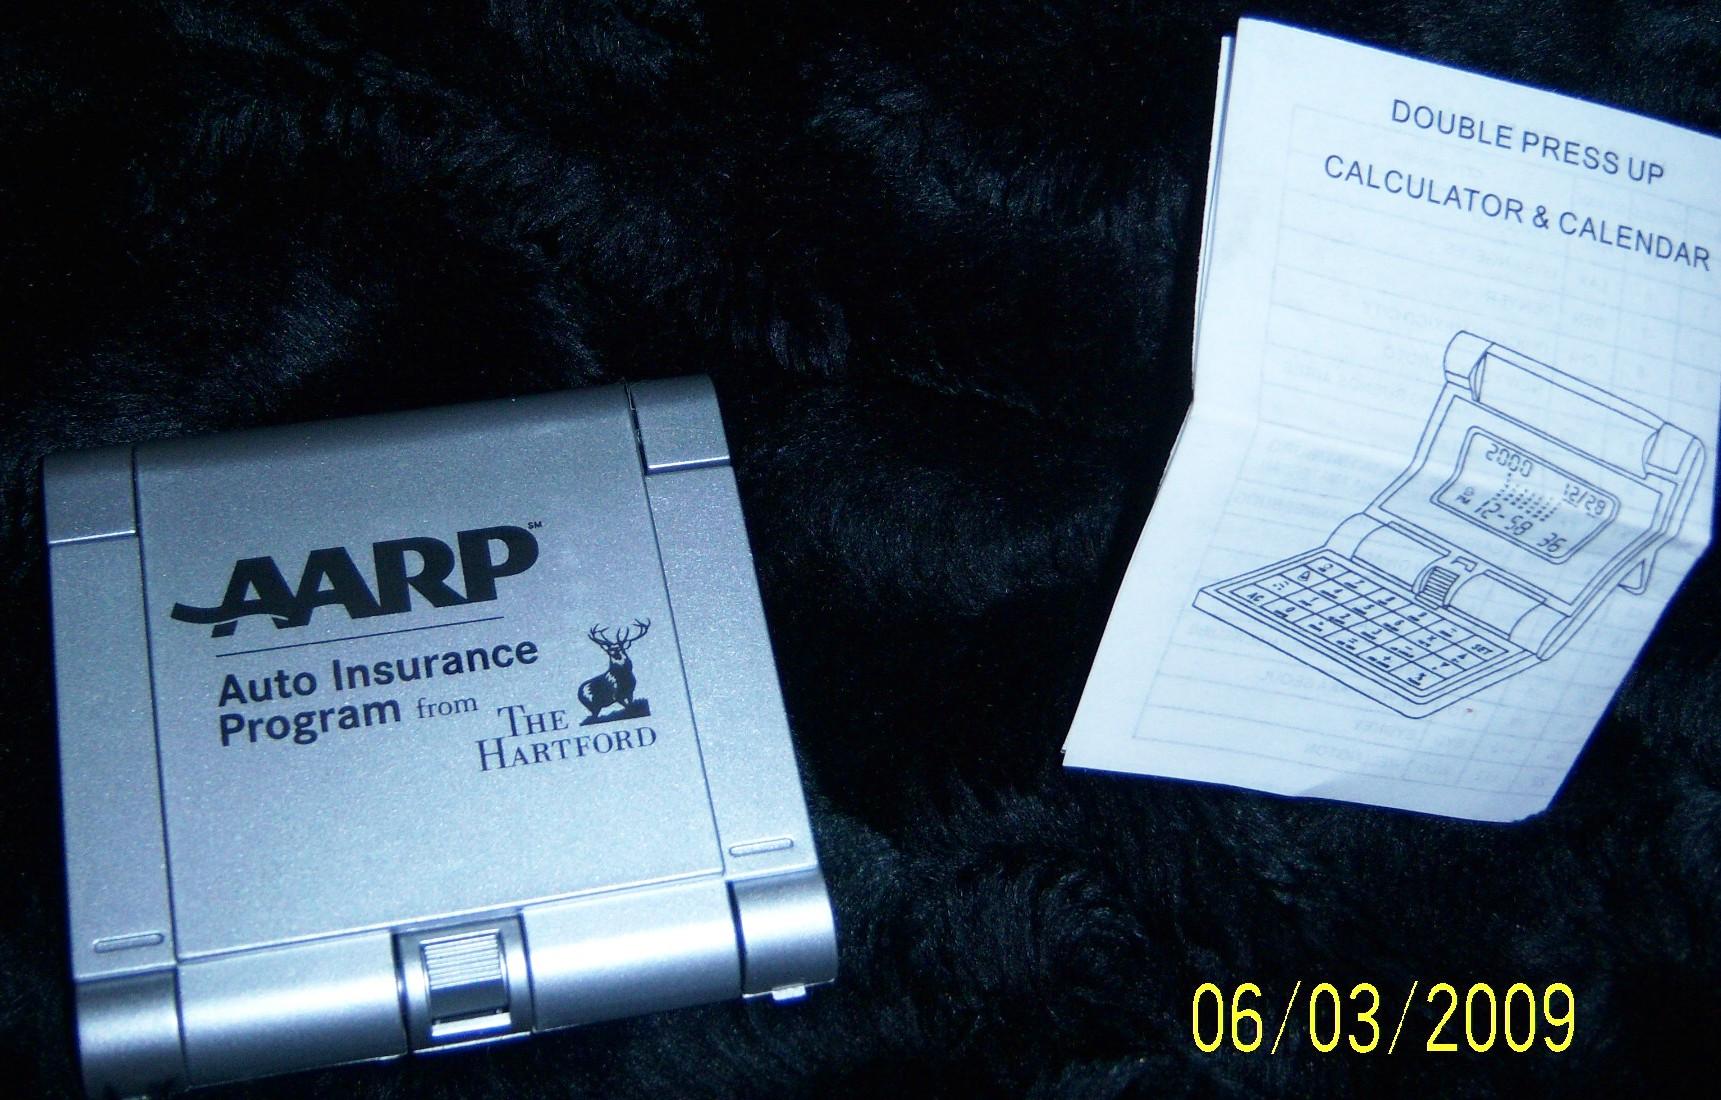 AARP digital calculator, calendar, and clock Unit